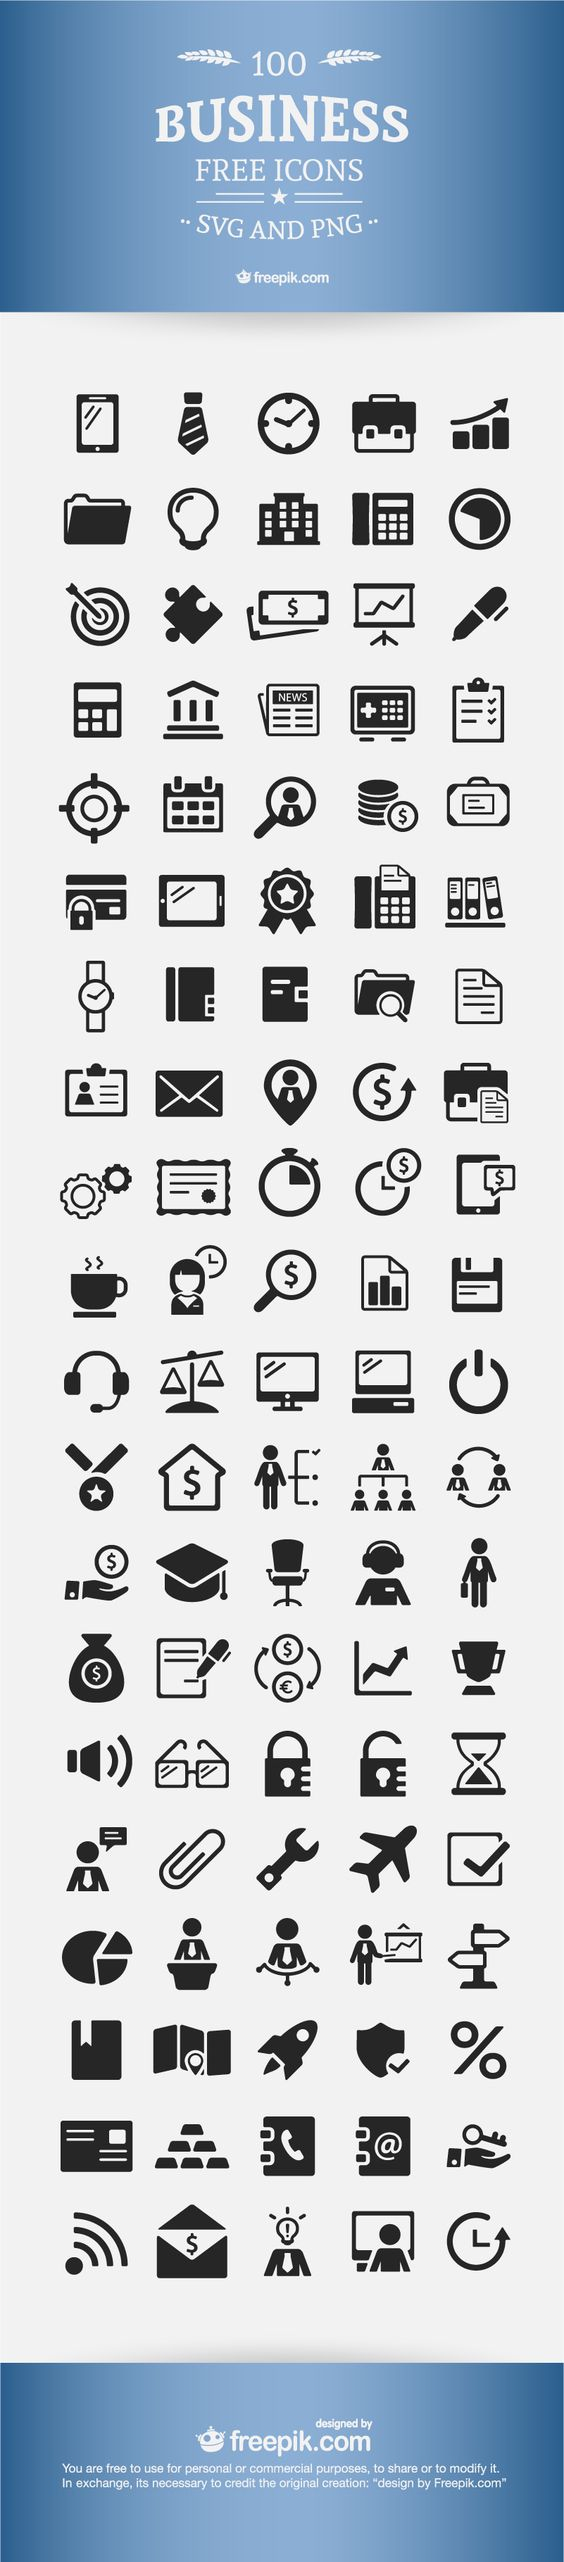 [Download] Free Business Icons 100 Vectors Bewerbung